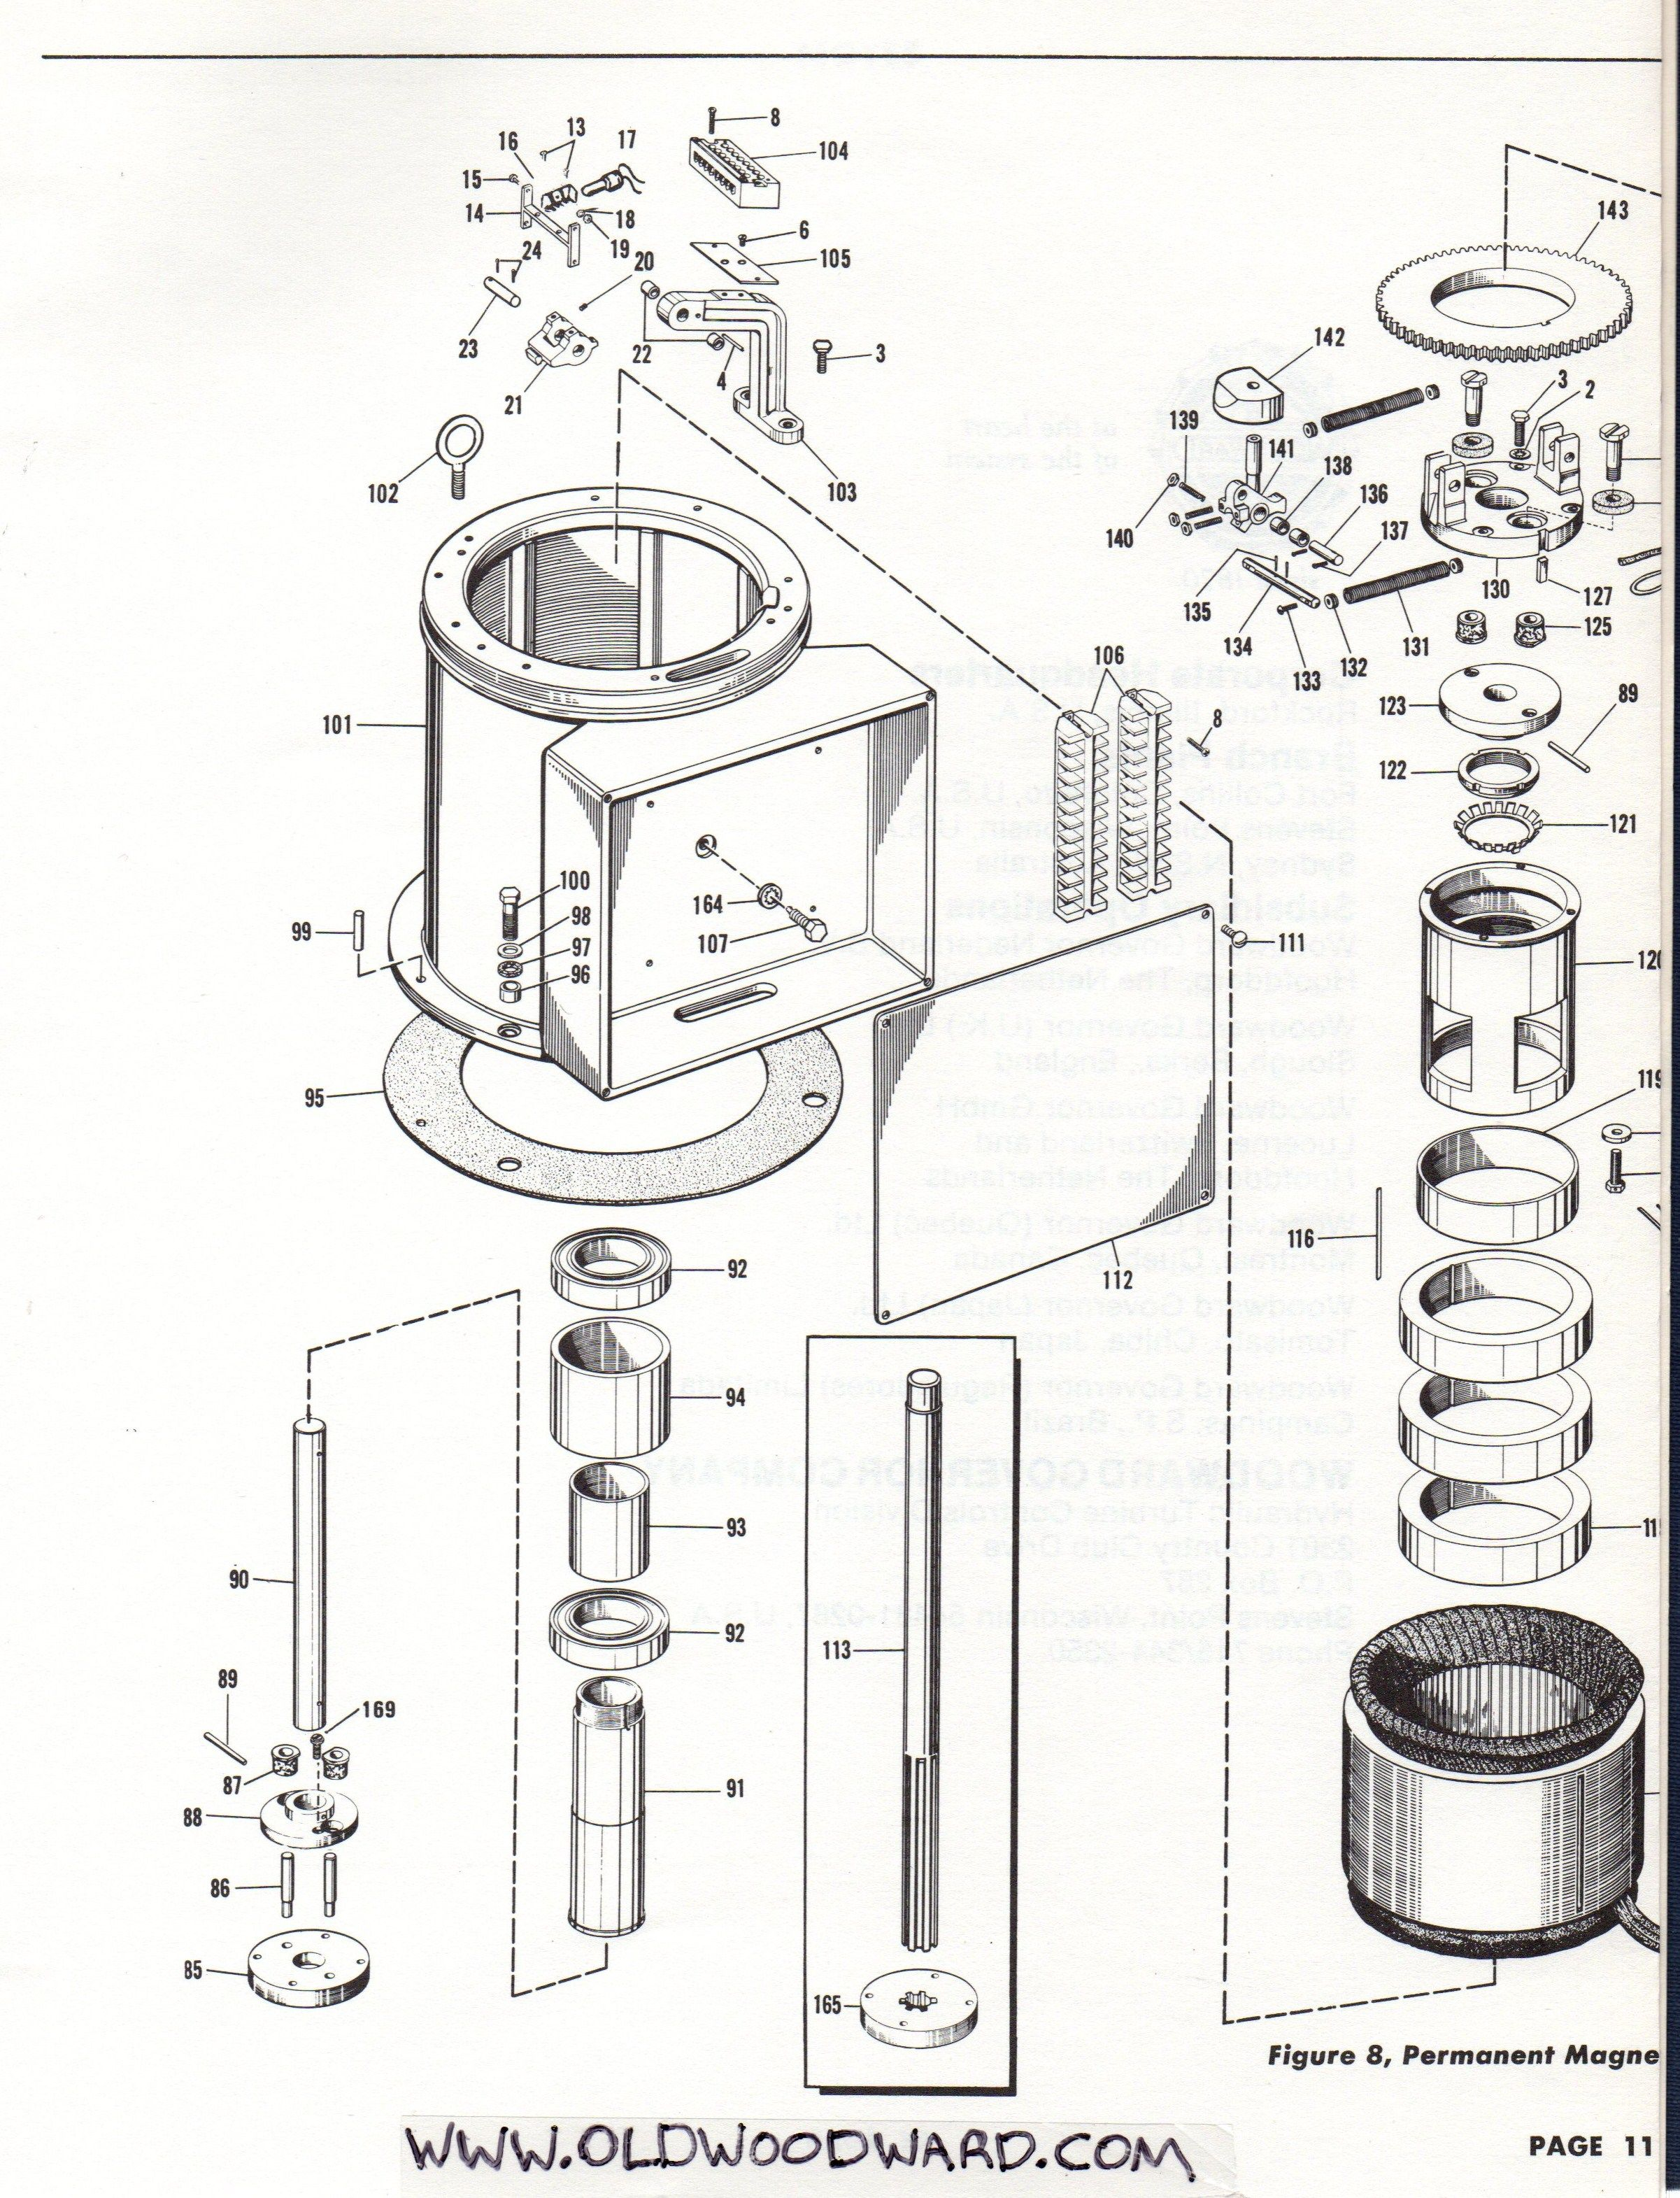 Wgc Manual K Permanent Magnet Generator For Woodward